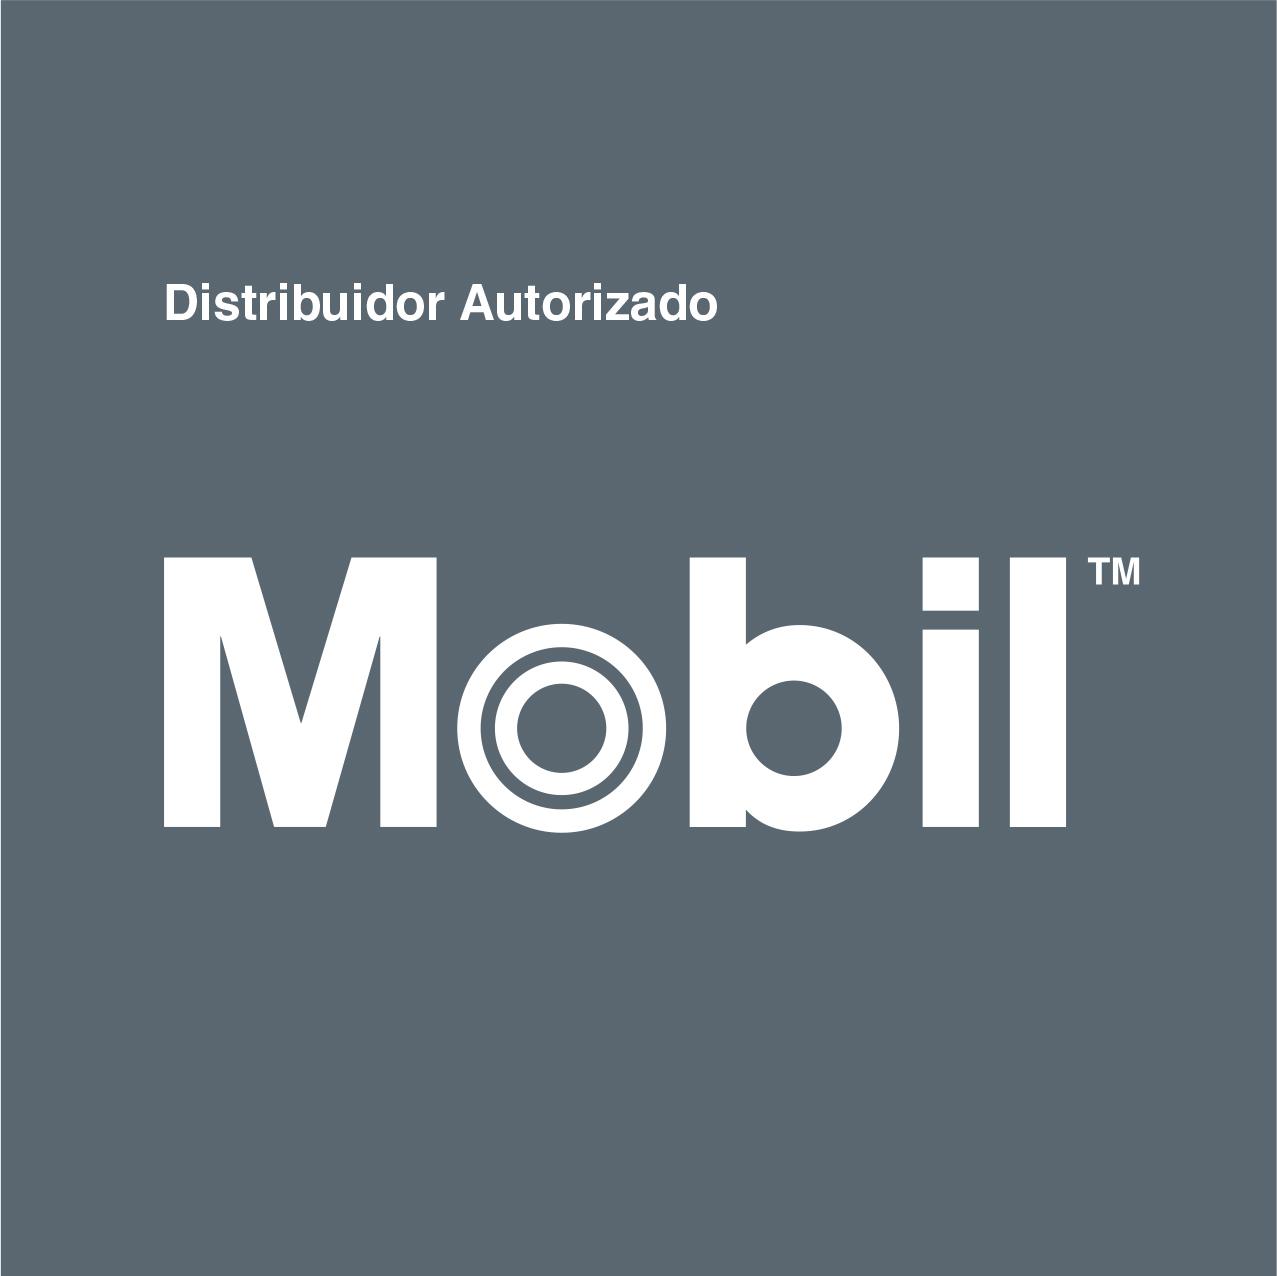 img-distribuidor-de-mobil